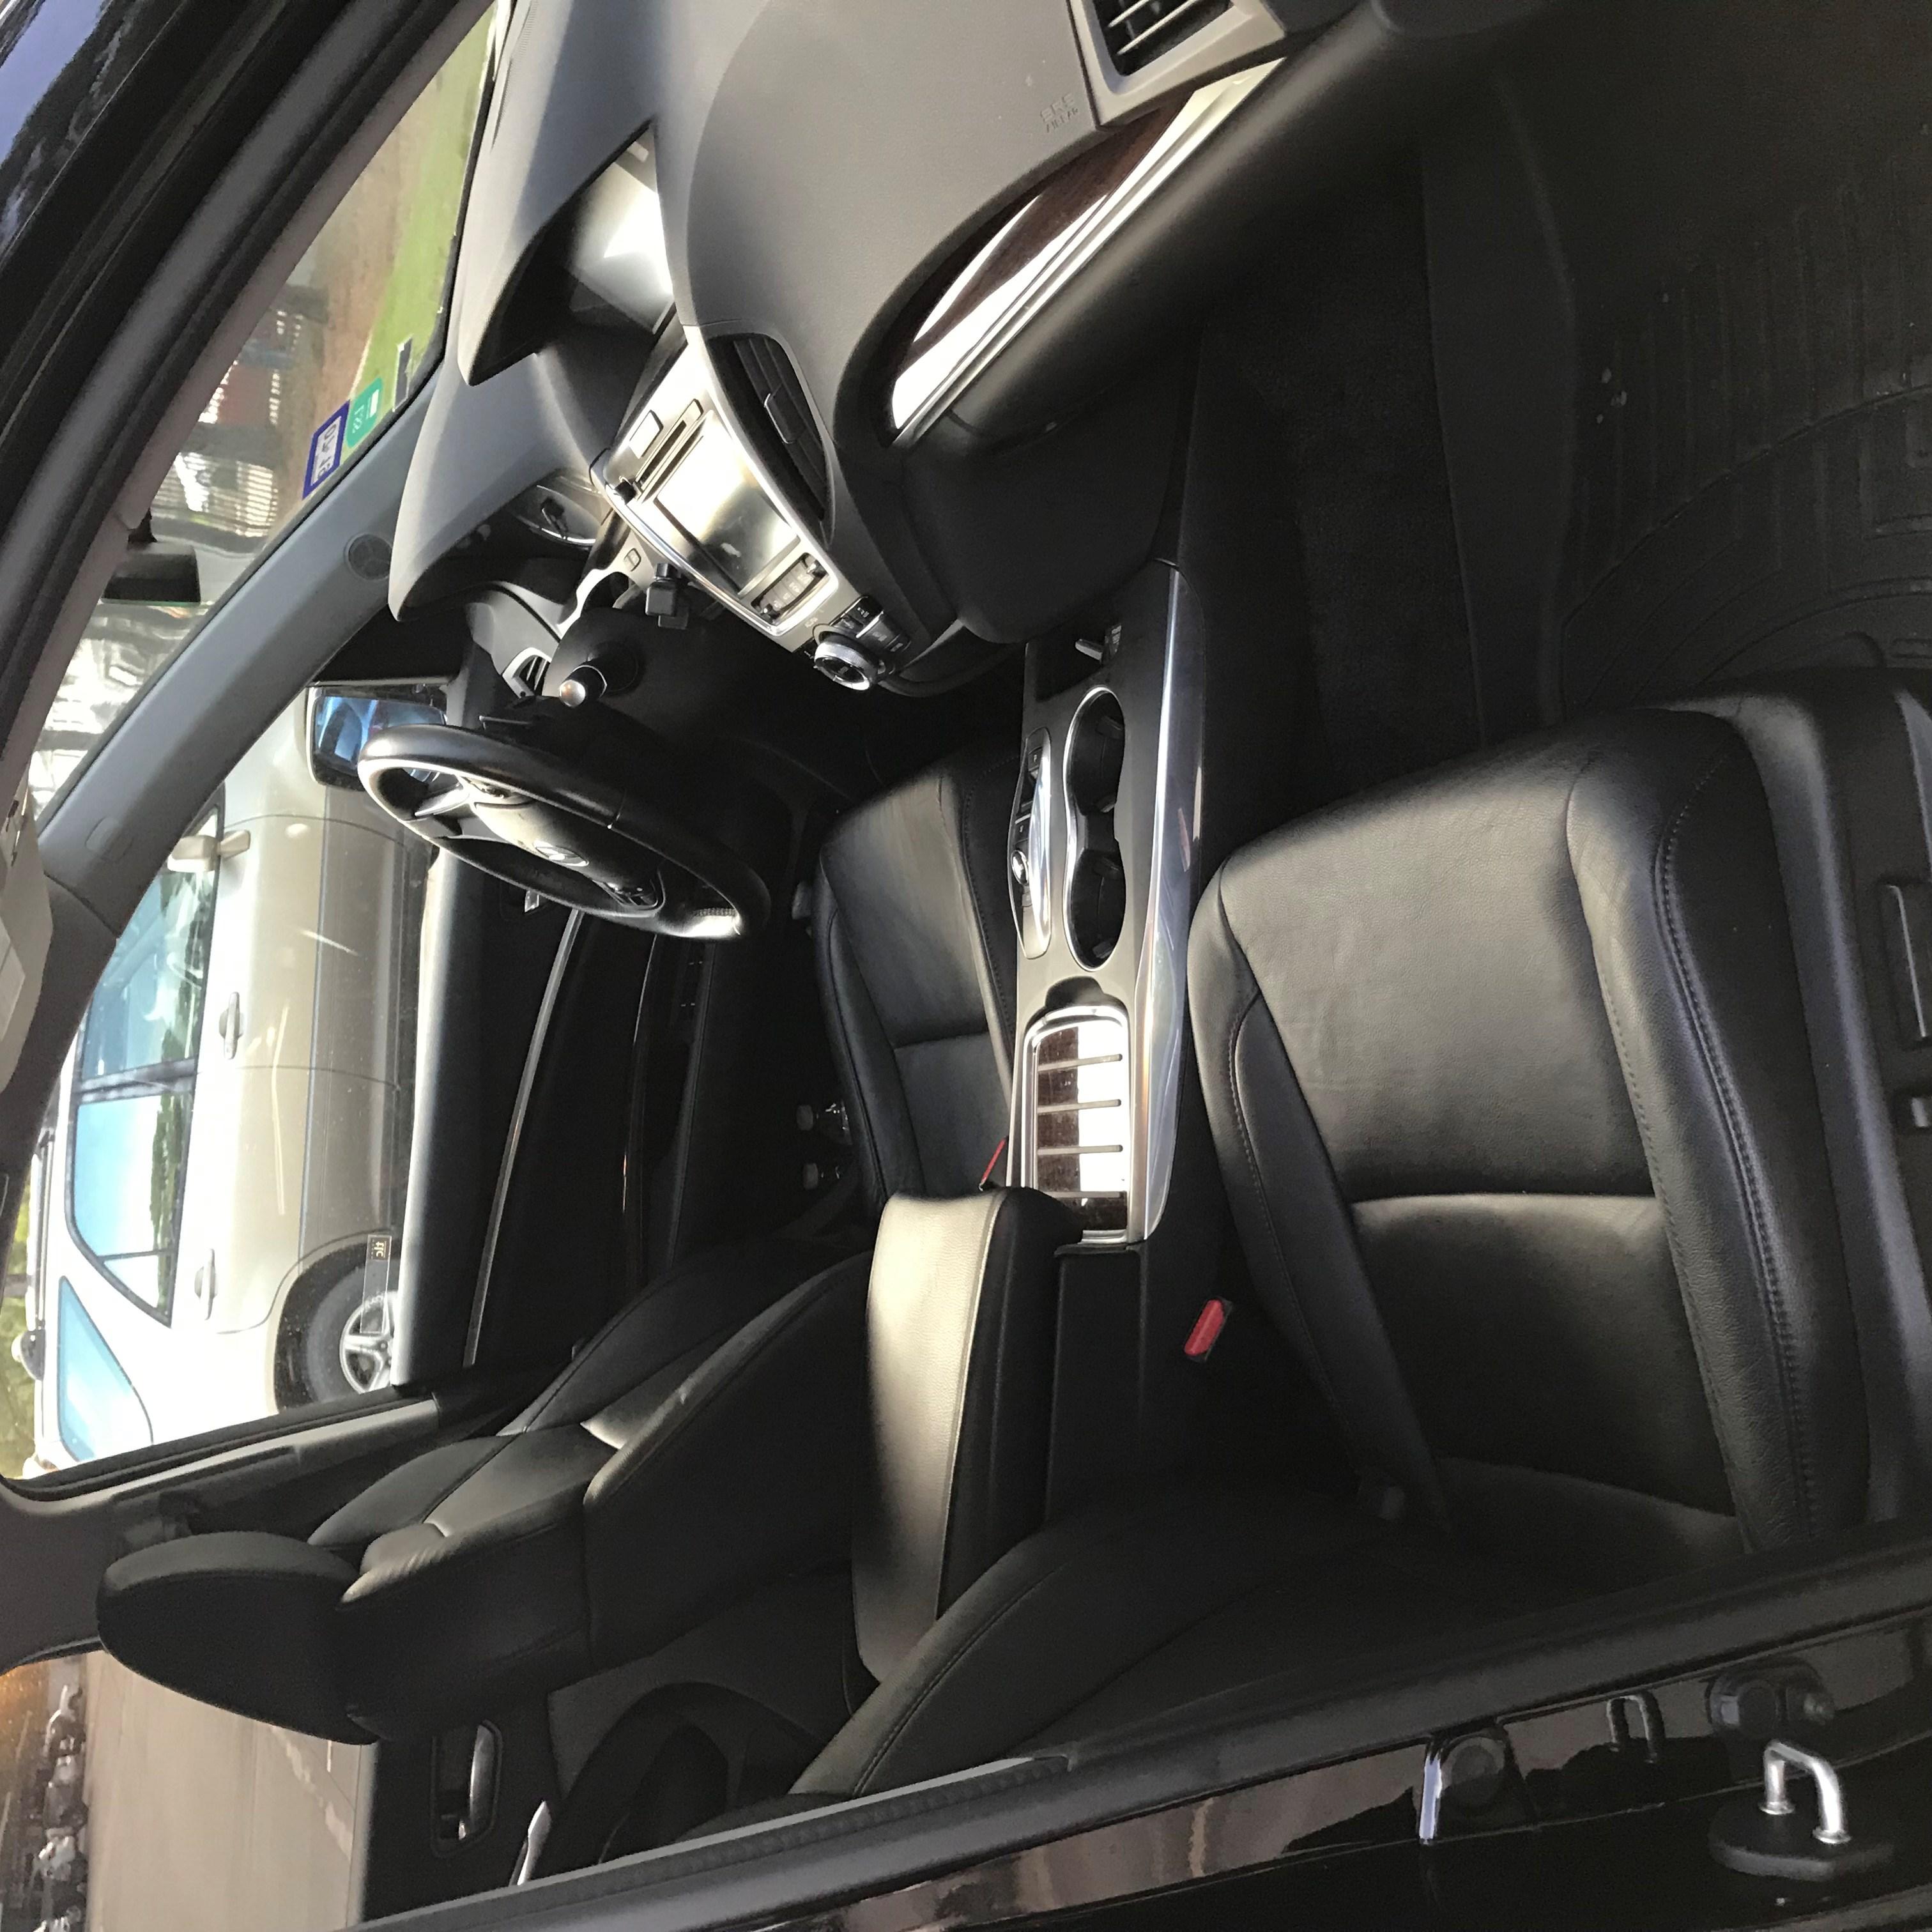 ACURA MDX 2016, LOW MILES 30600 $25,500, Used Acura MDX